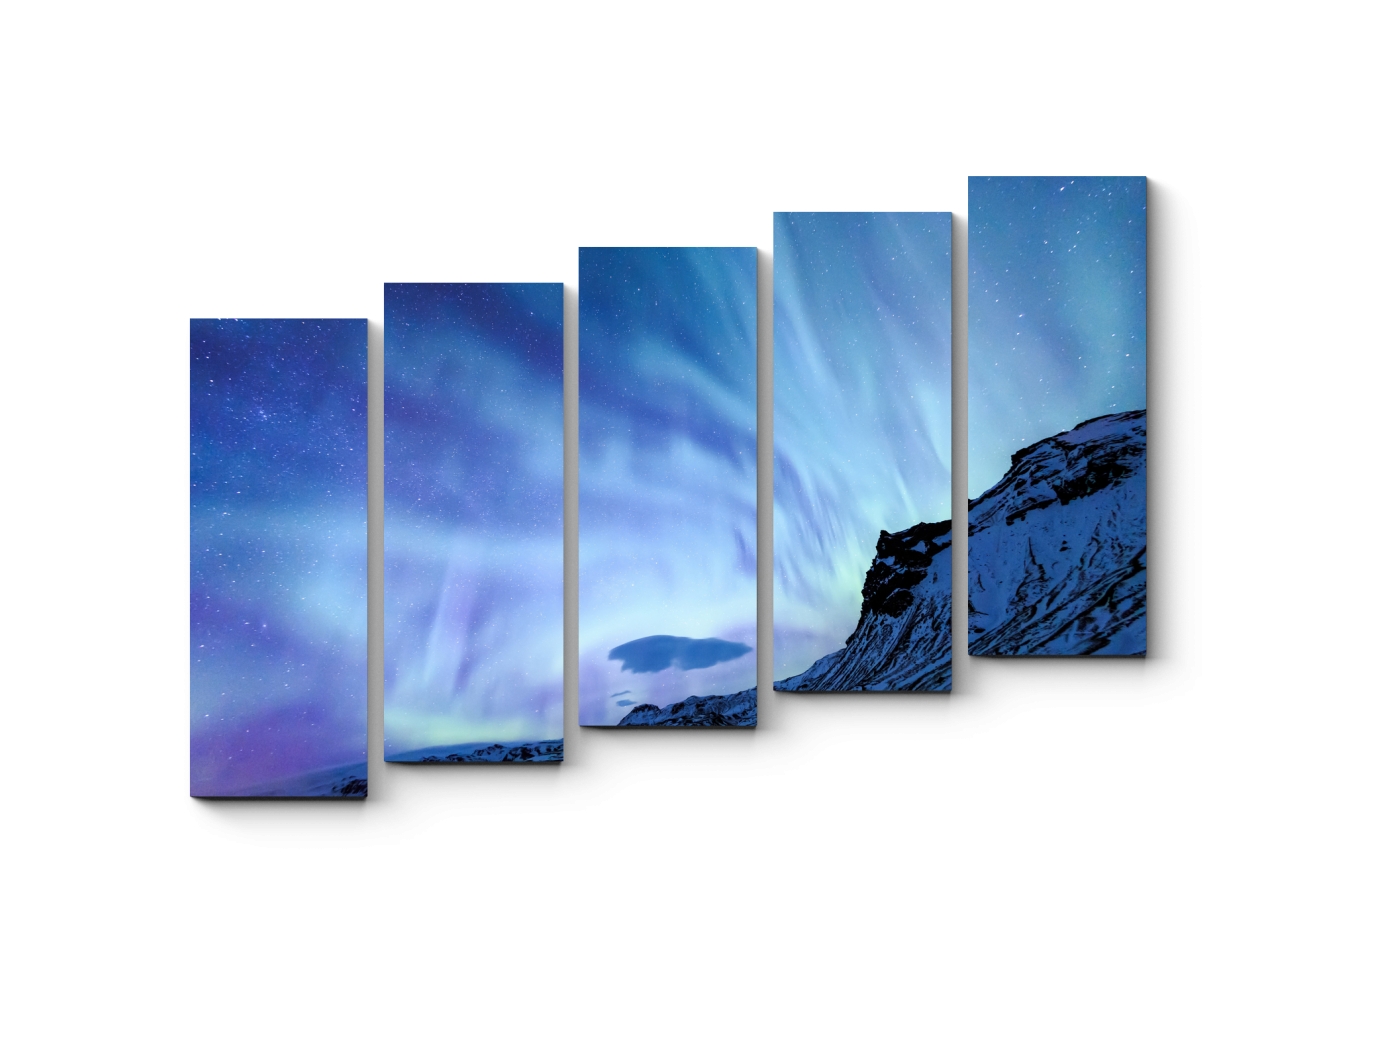 Модульная картина Северное сияние над Исландией (90x63) фото